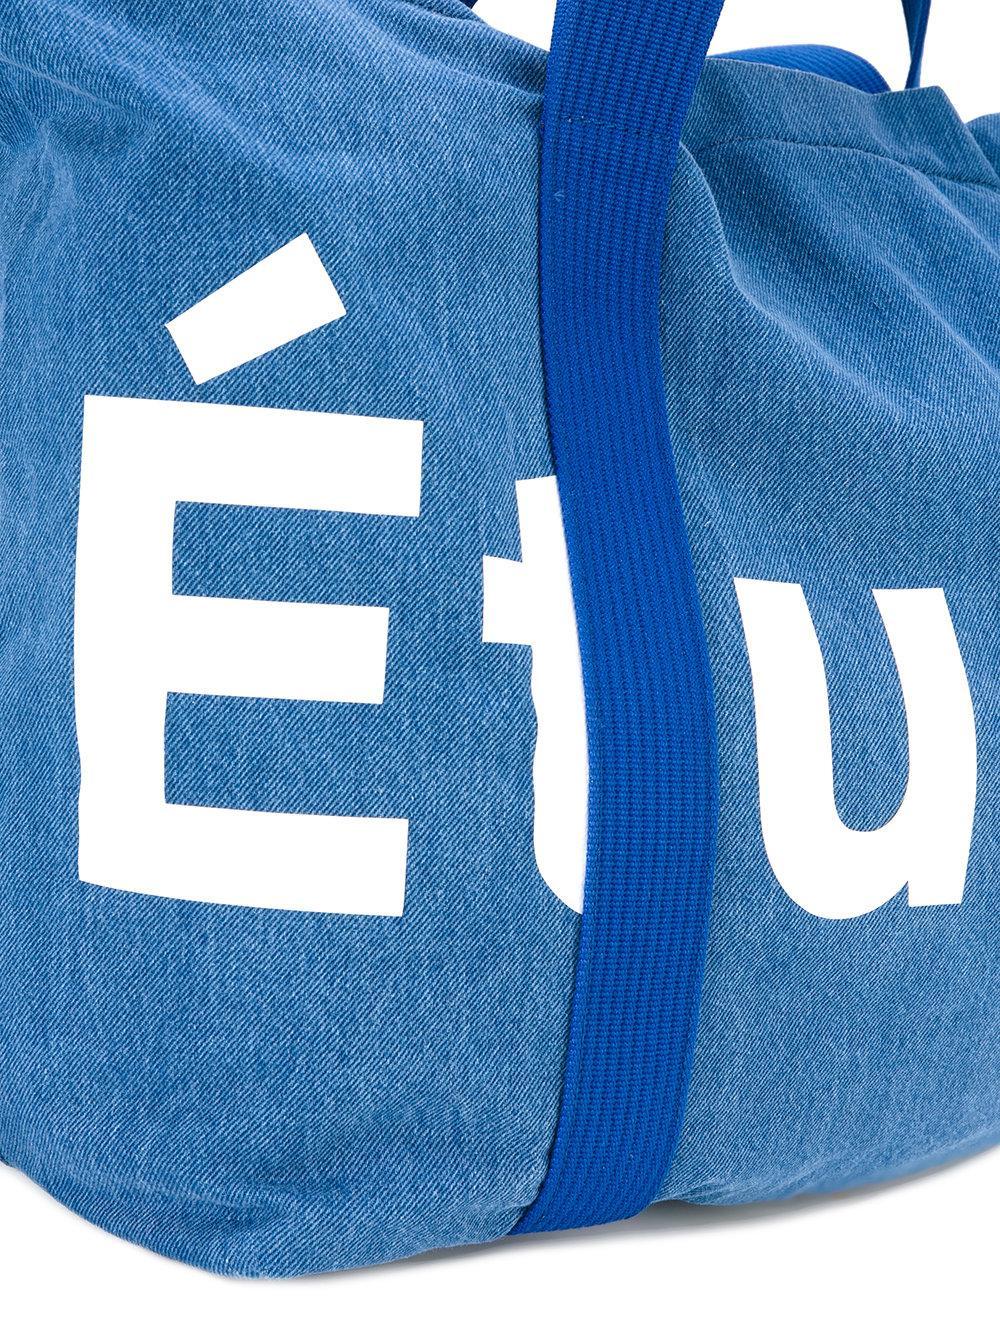 Etudes Studio Cotton Logo Stamped Tote Bag in Blue for Men